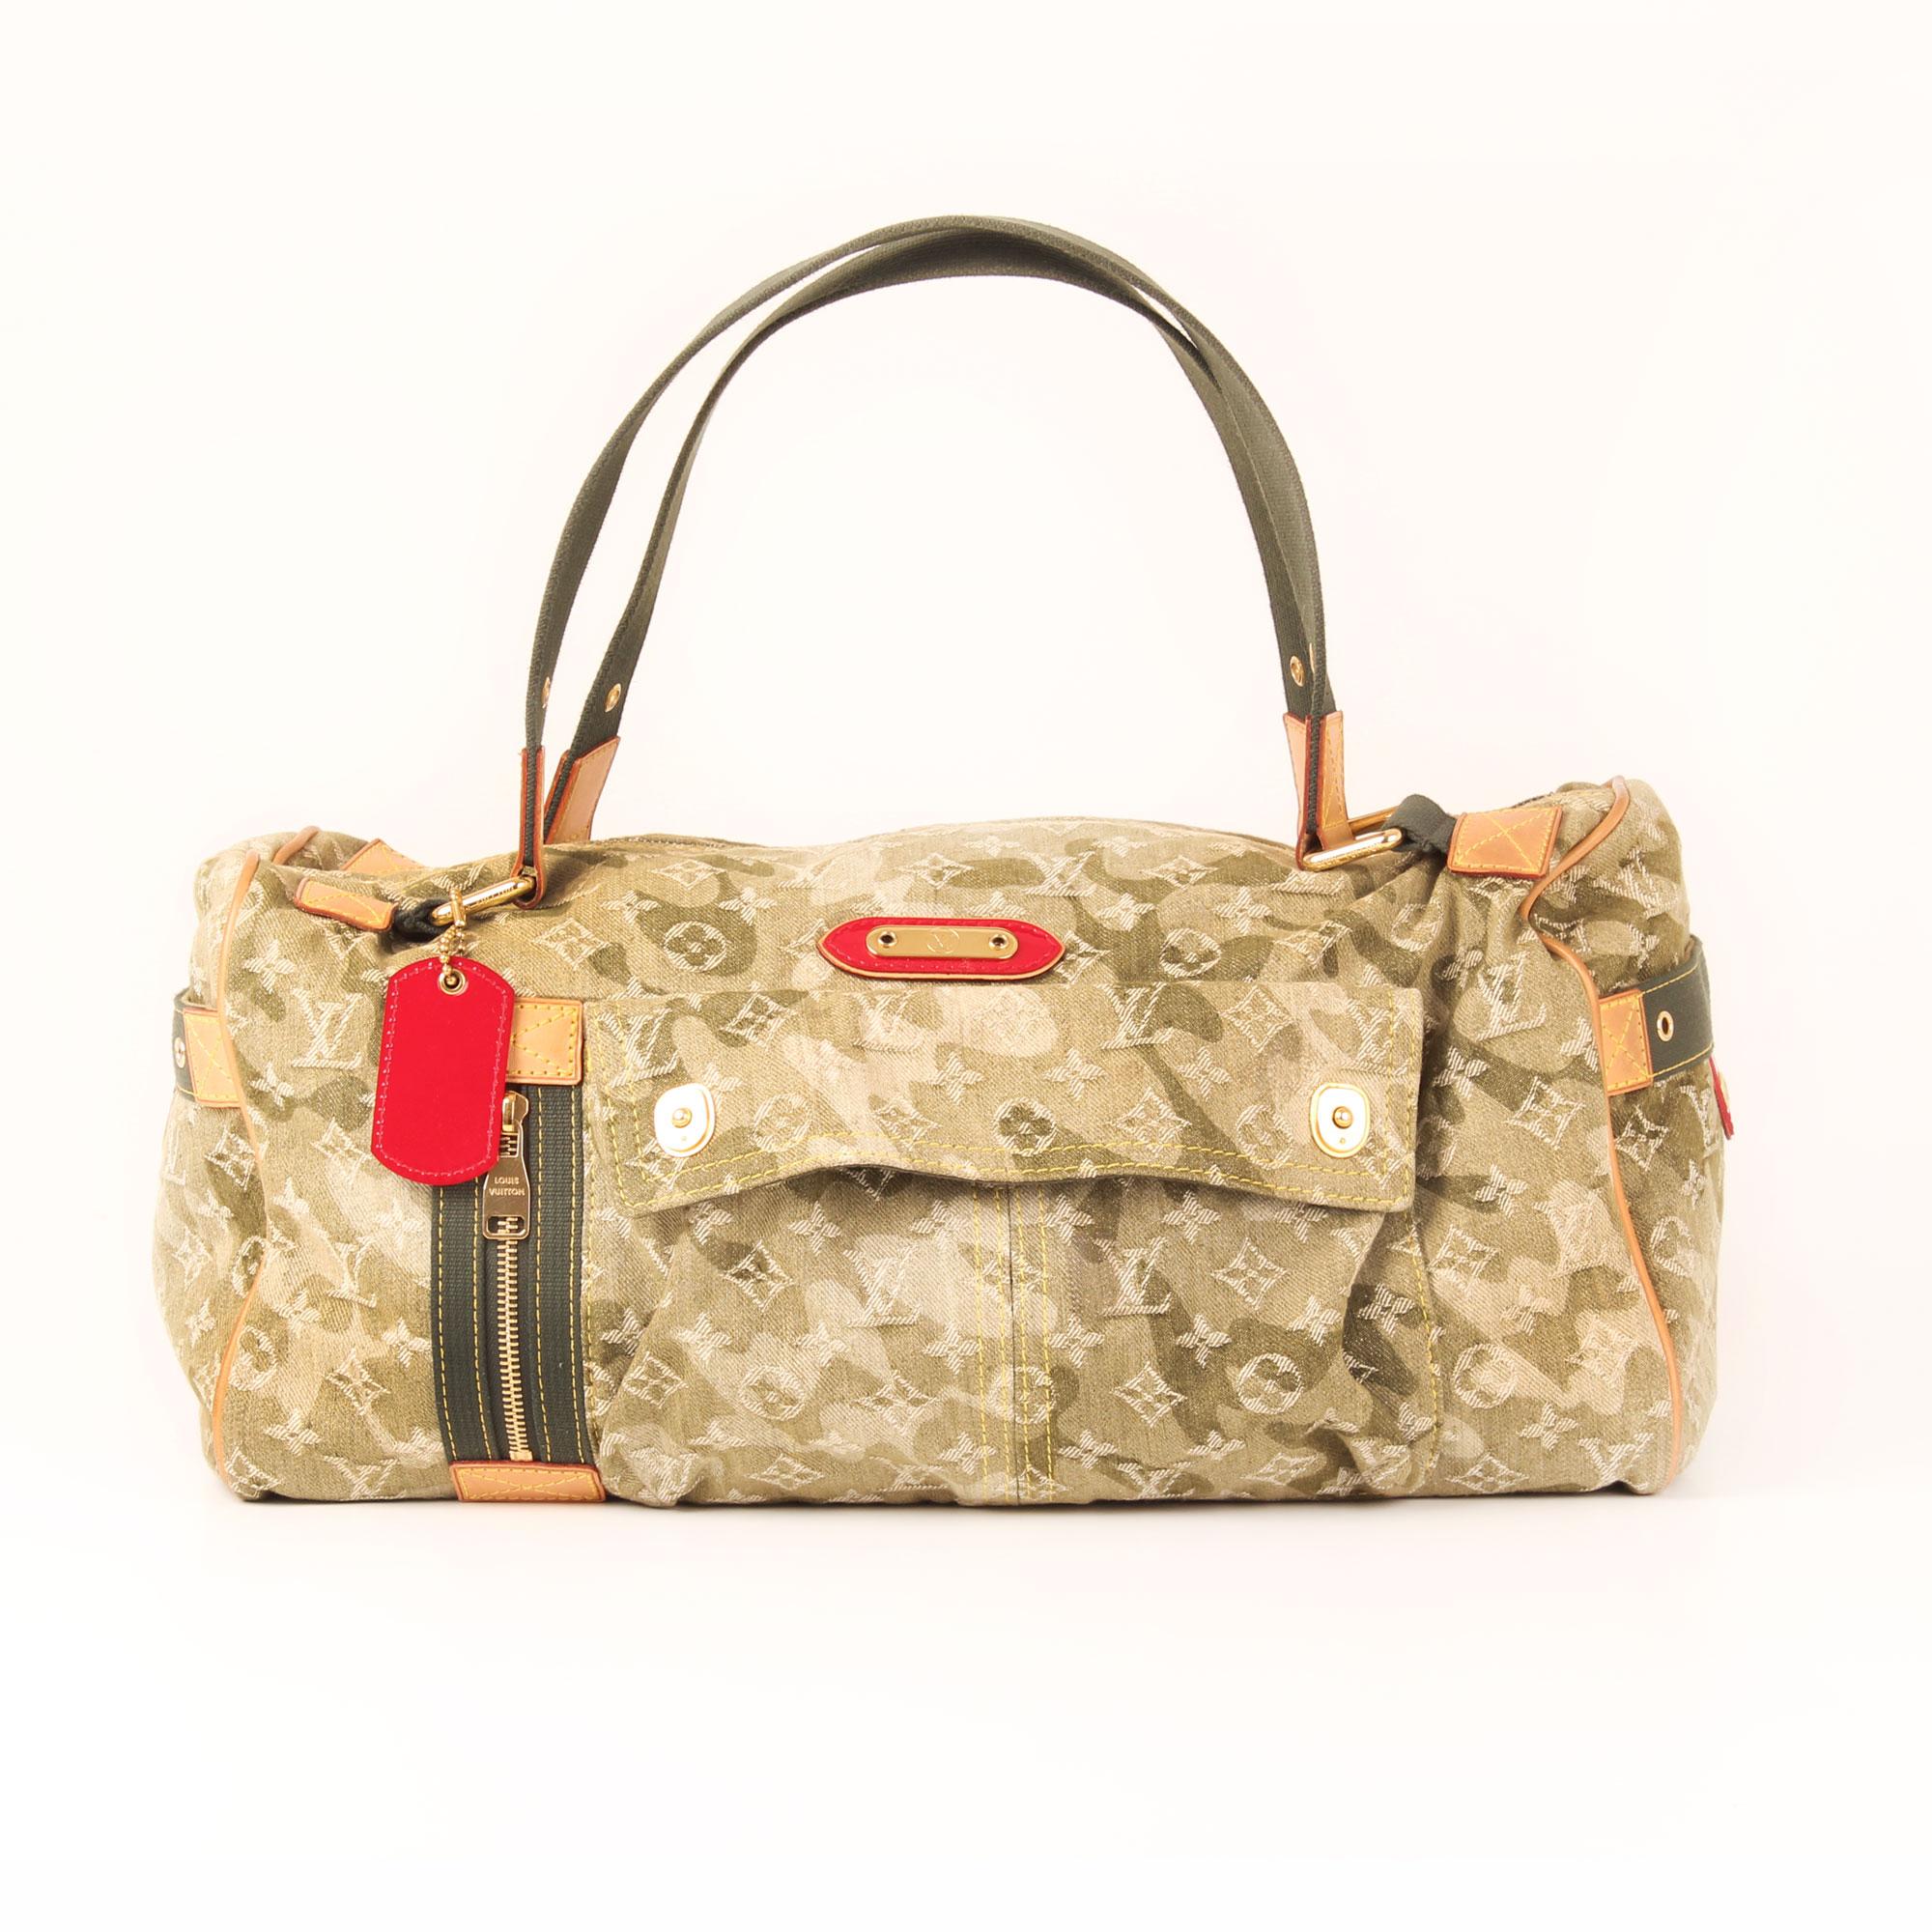 3494ff1f5 Louis Vuitton Monogramouflage Lys Bag | CBL Bags